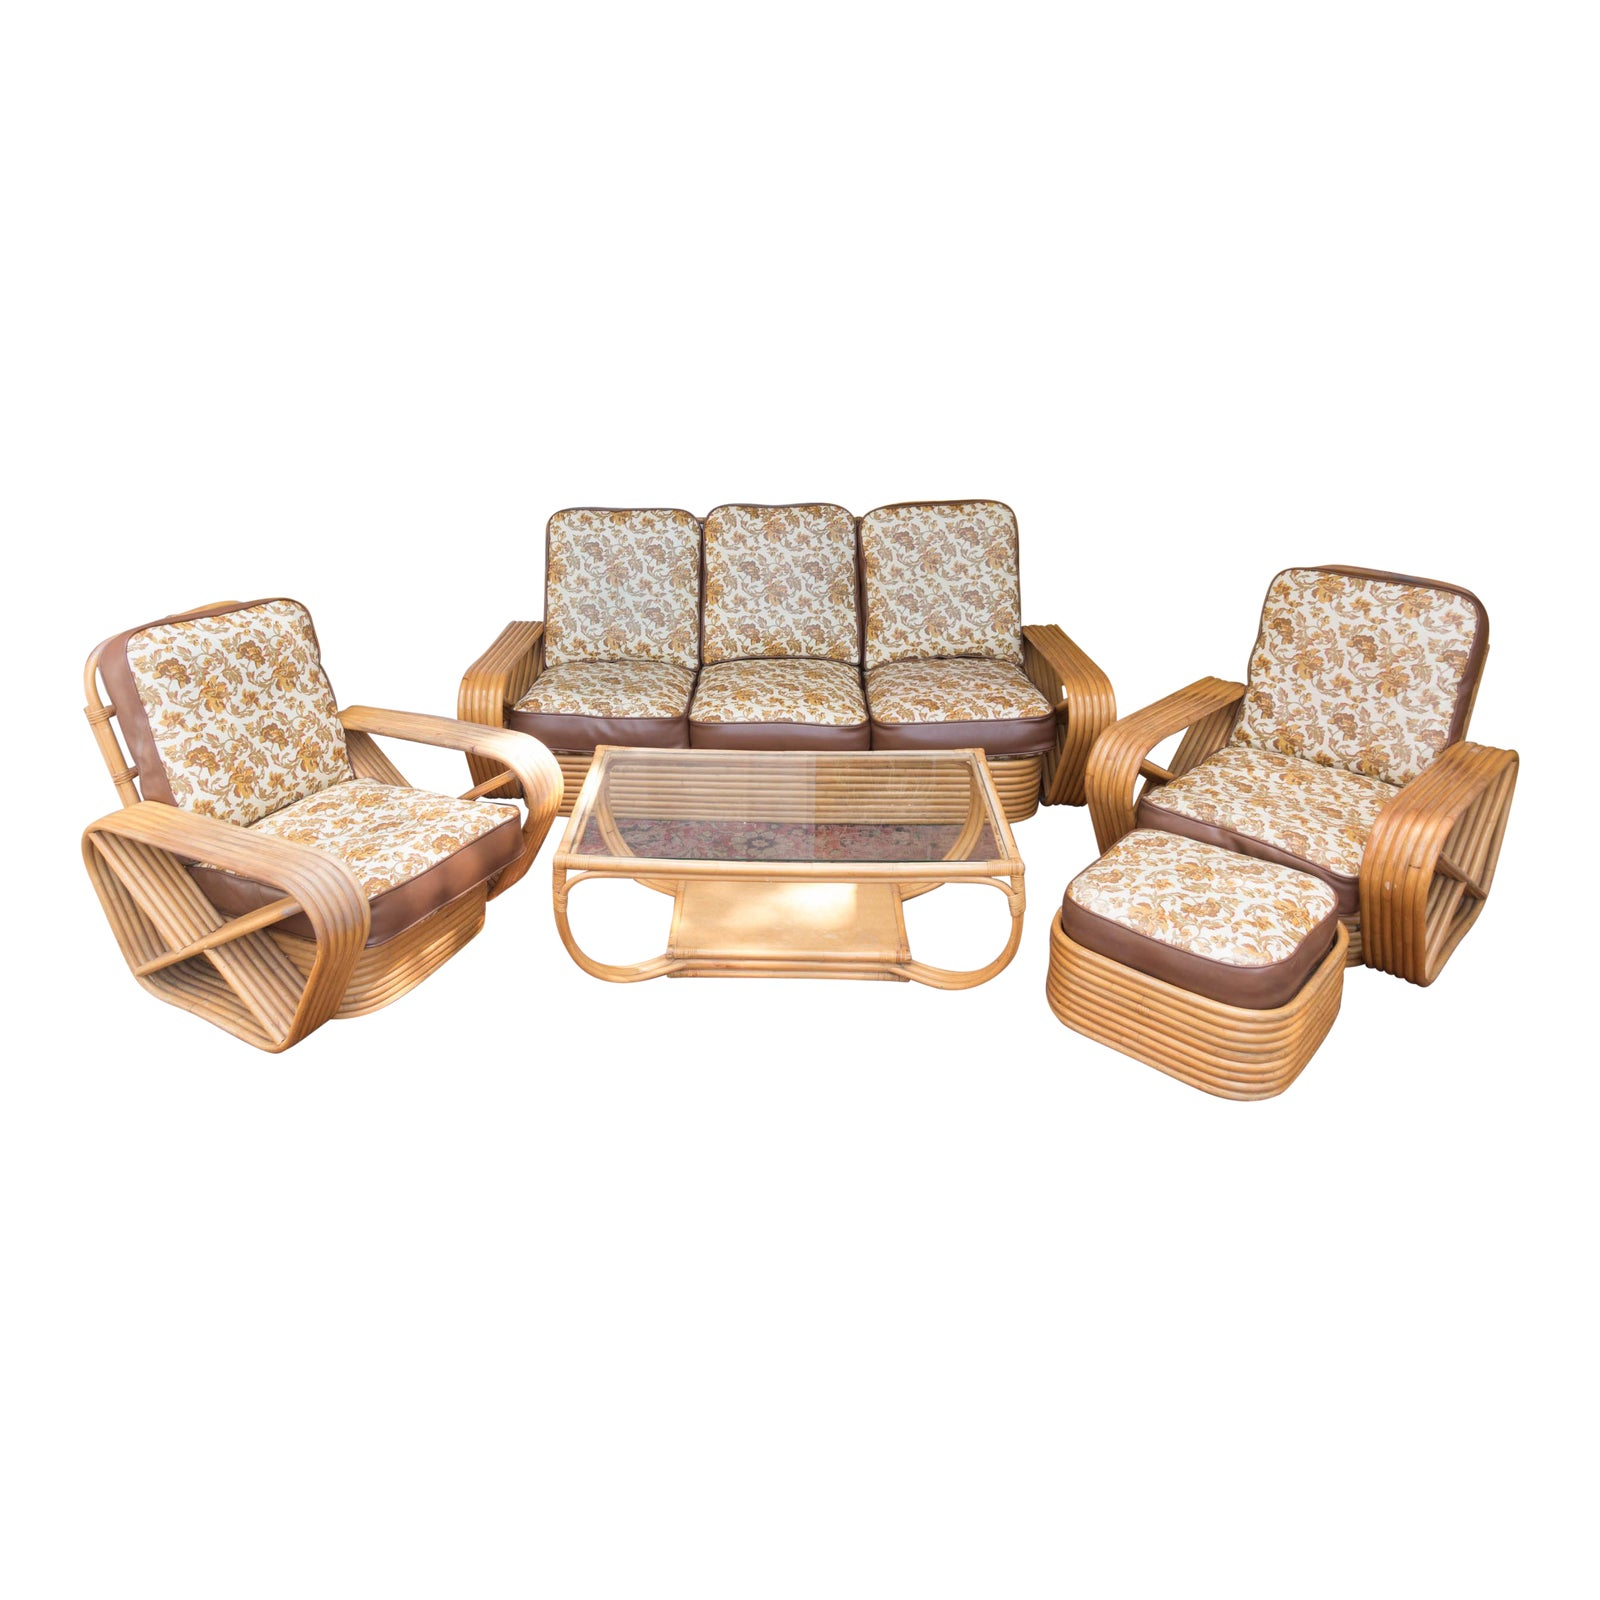 Paul Frankl Pretzel Rattan Living Room Set | Chairish